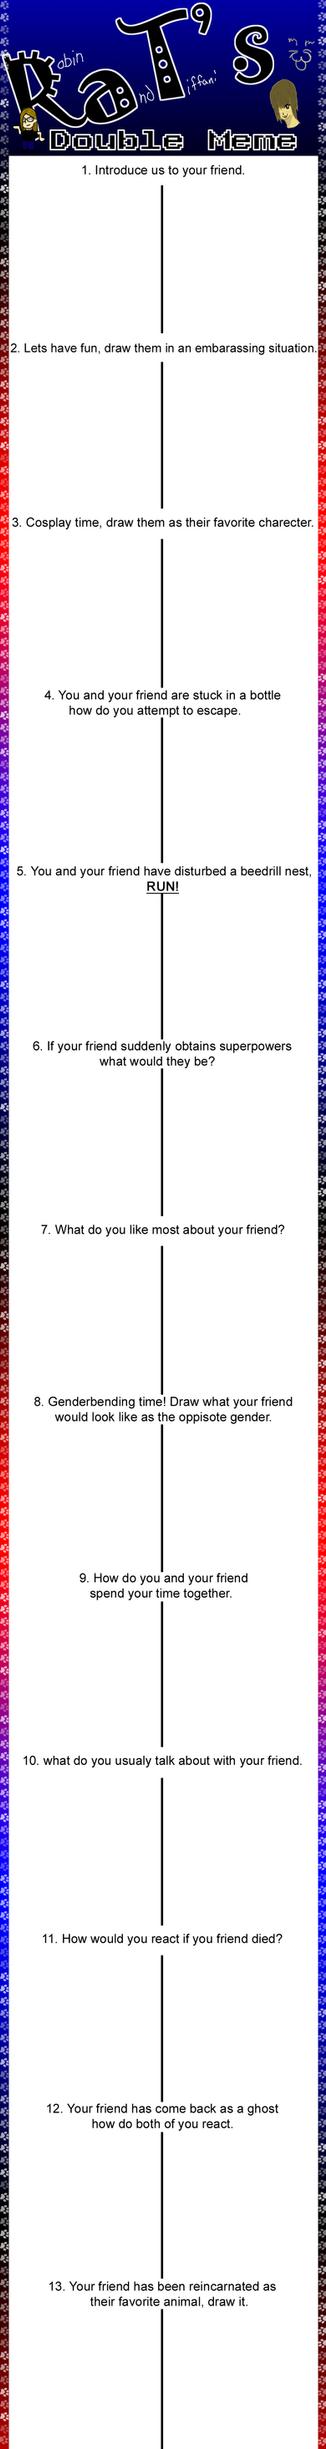 RaT's Double Friend Meme by Incognito-77